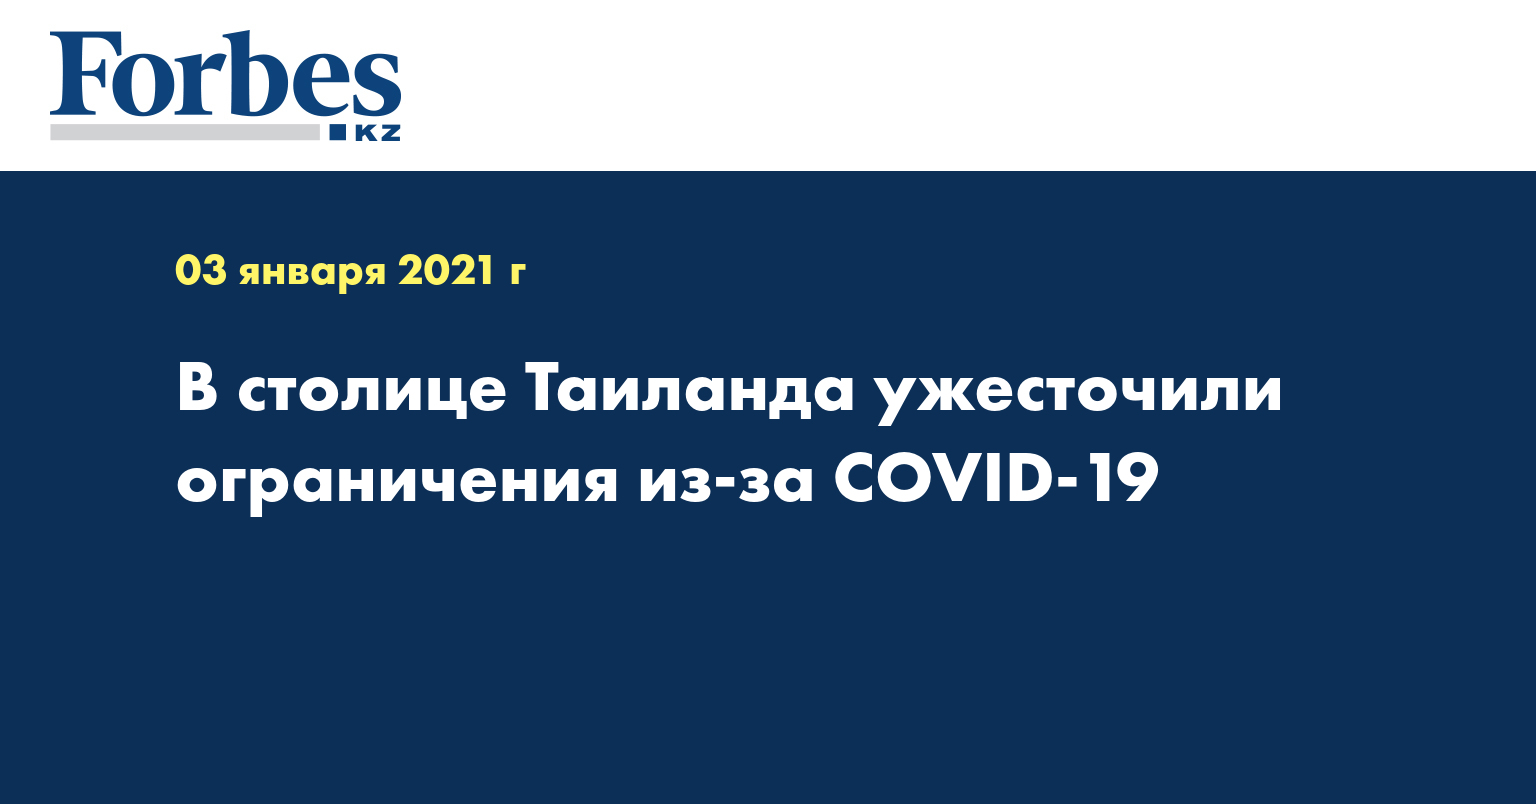 В столице Таиланда ужесточили ограничения из-за COVID-19